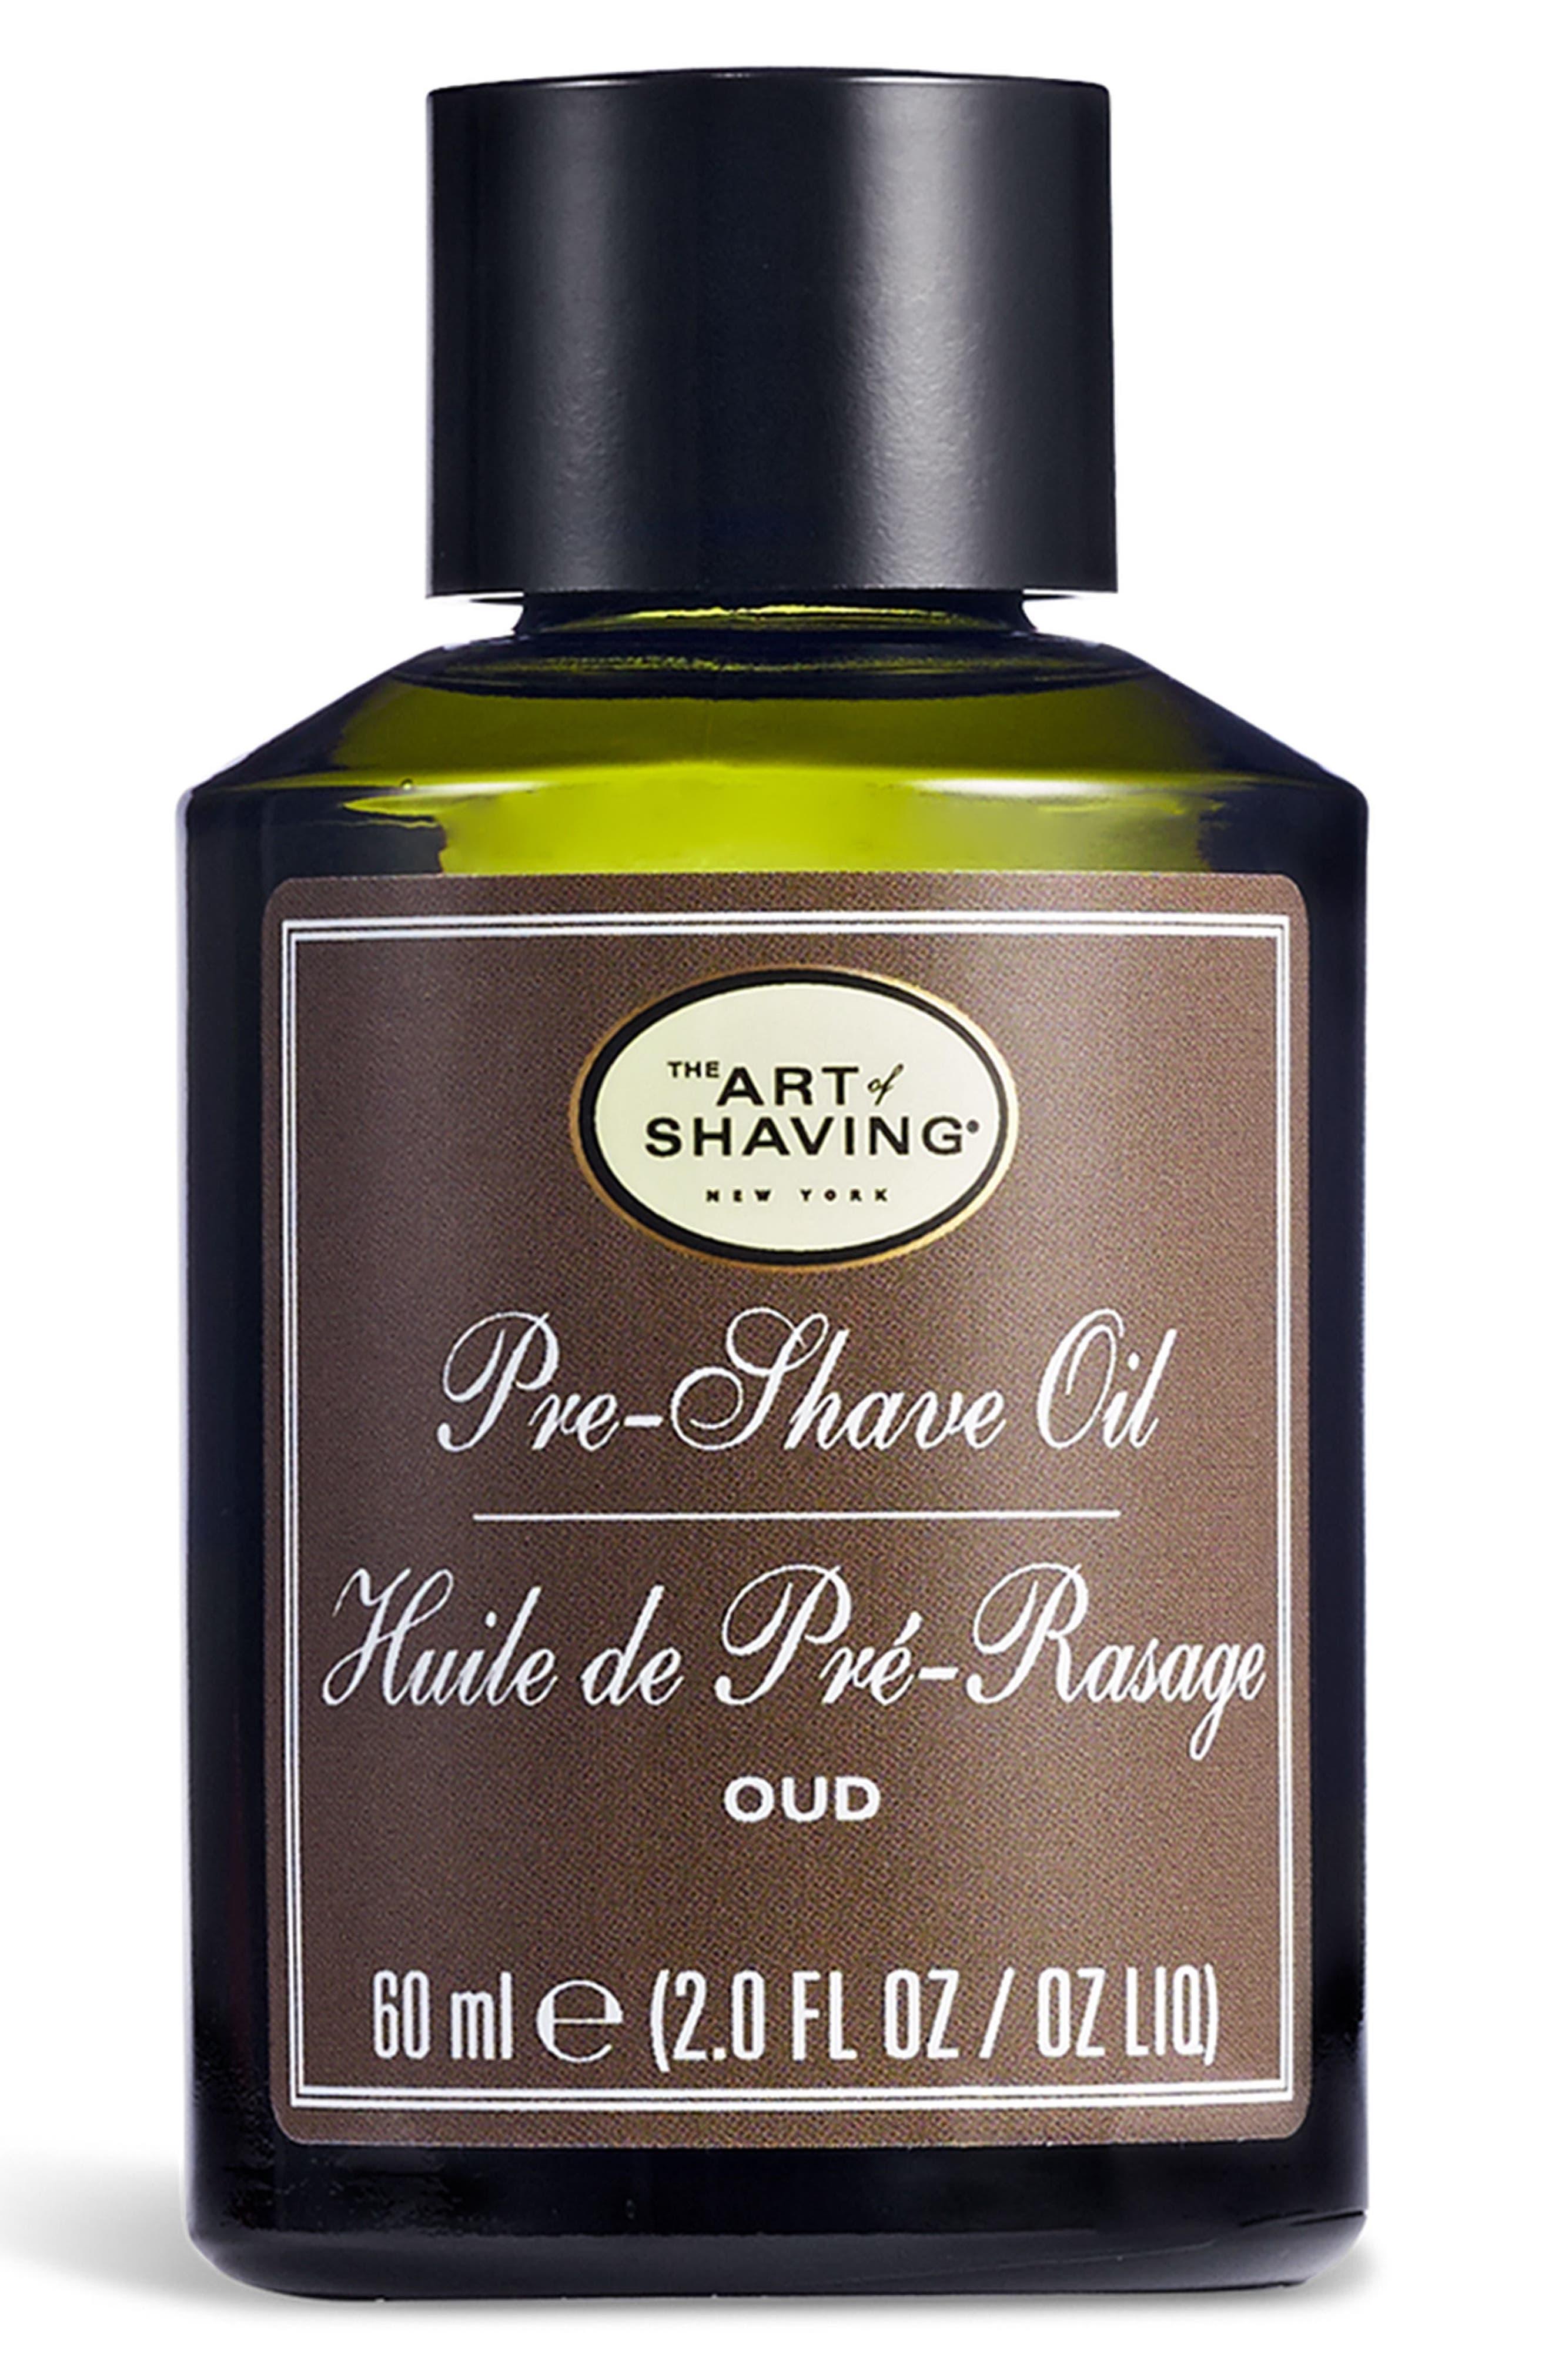 The Art of Shaving® Oud Pre-Shave Oil